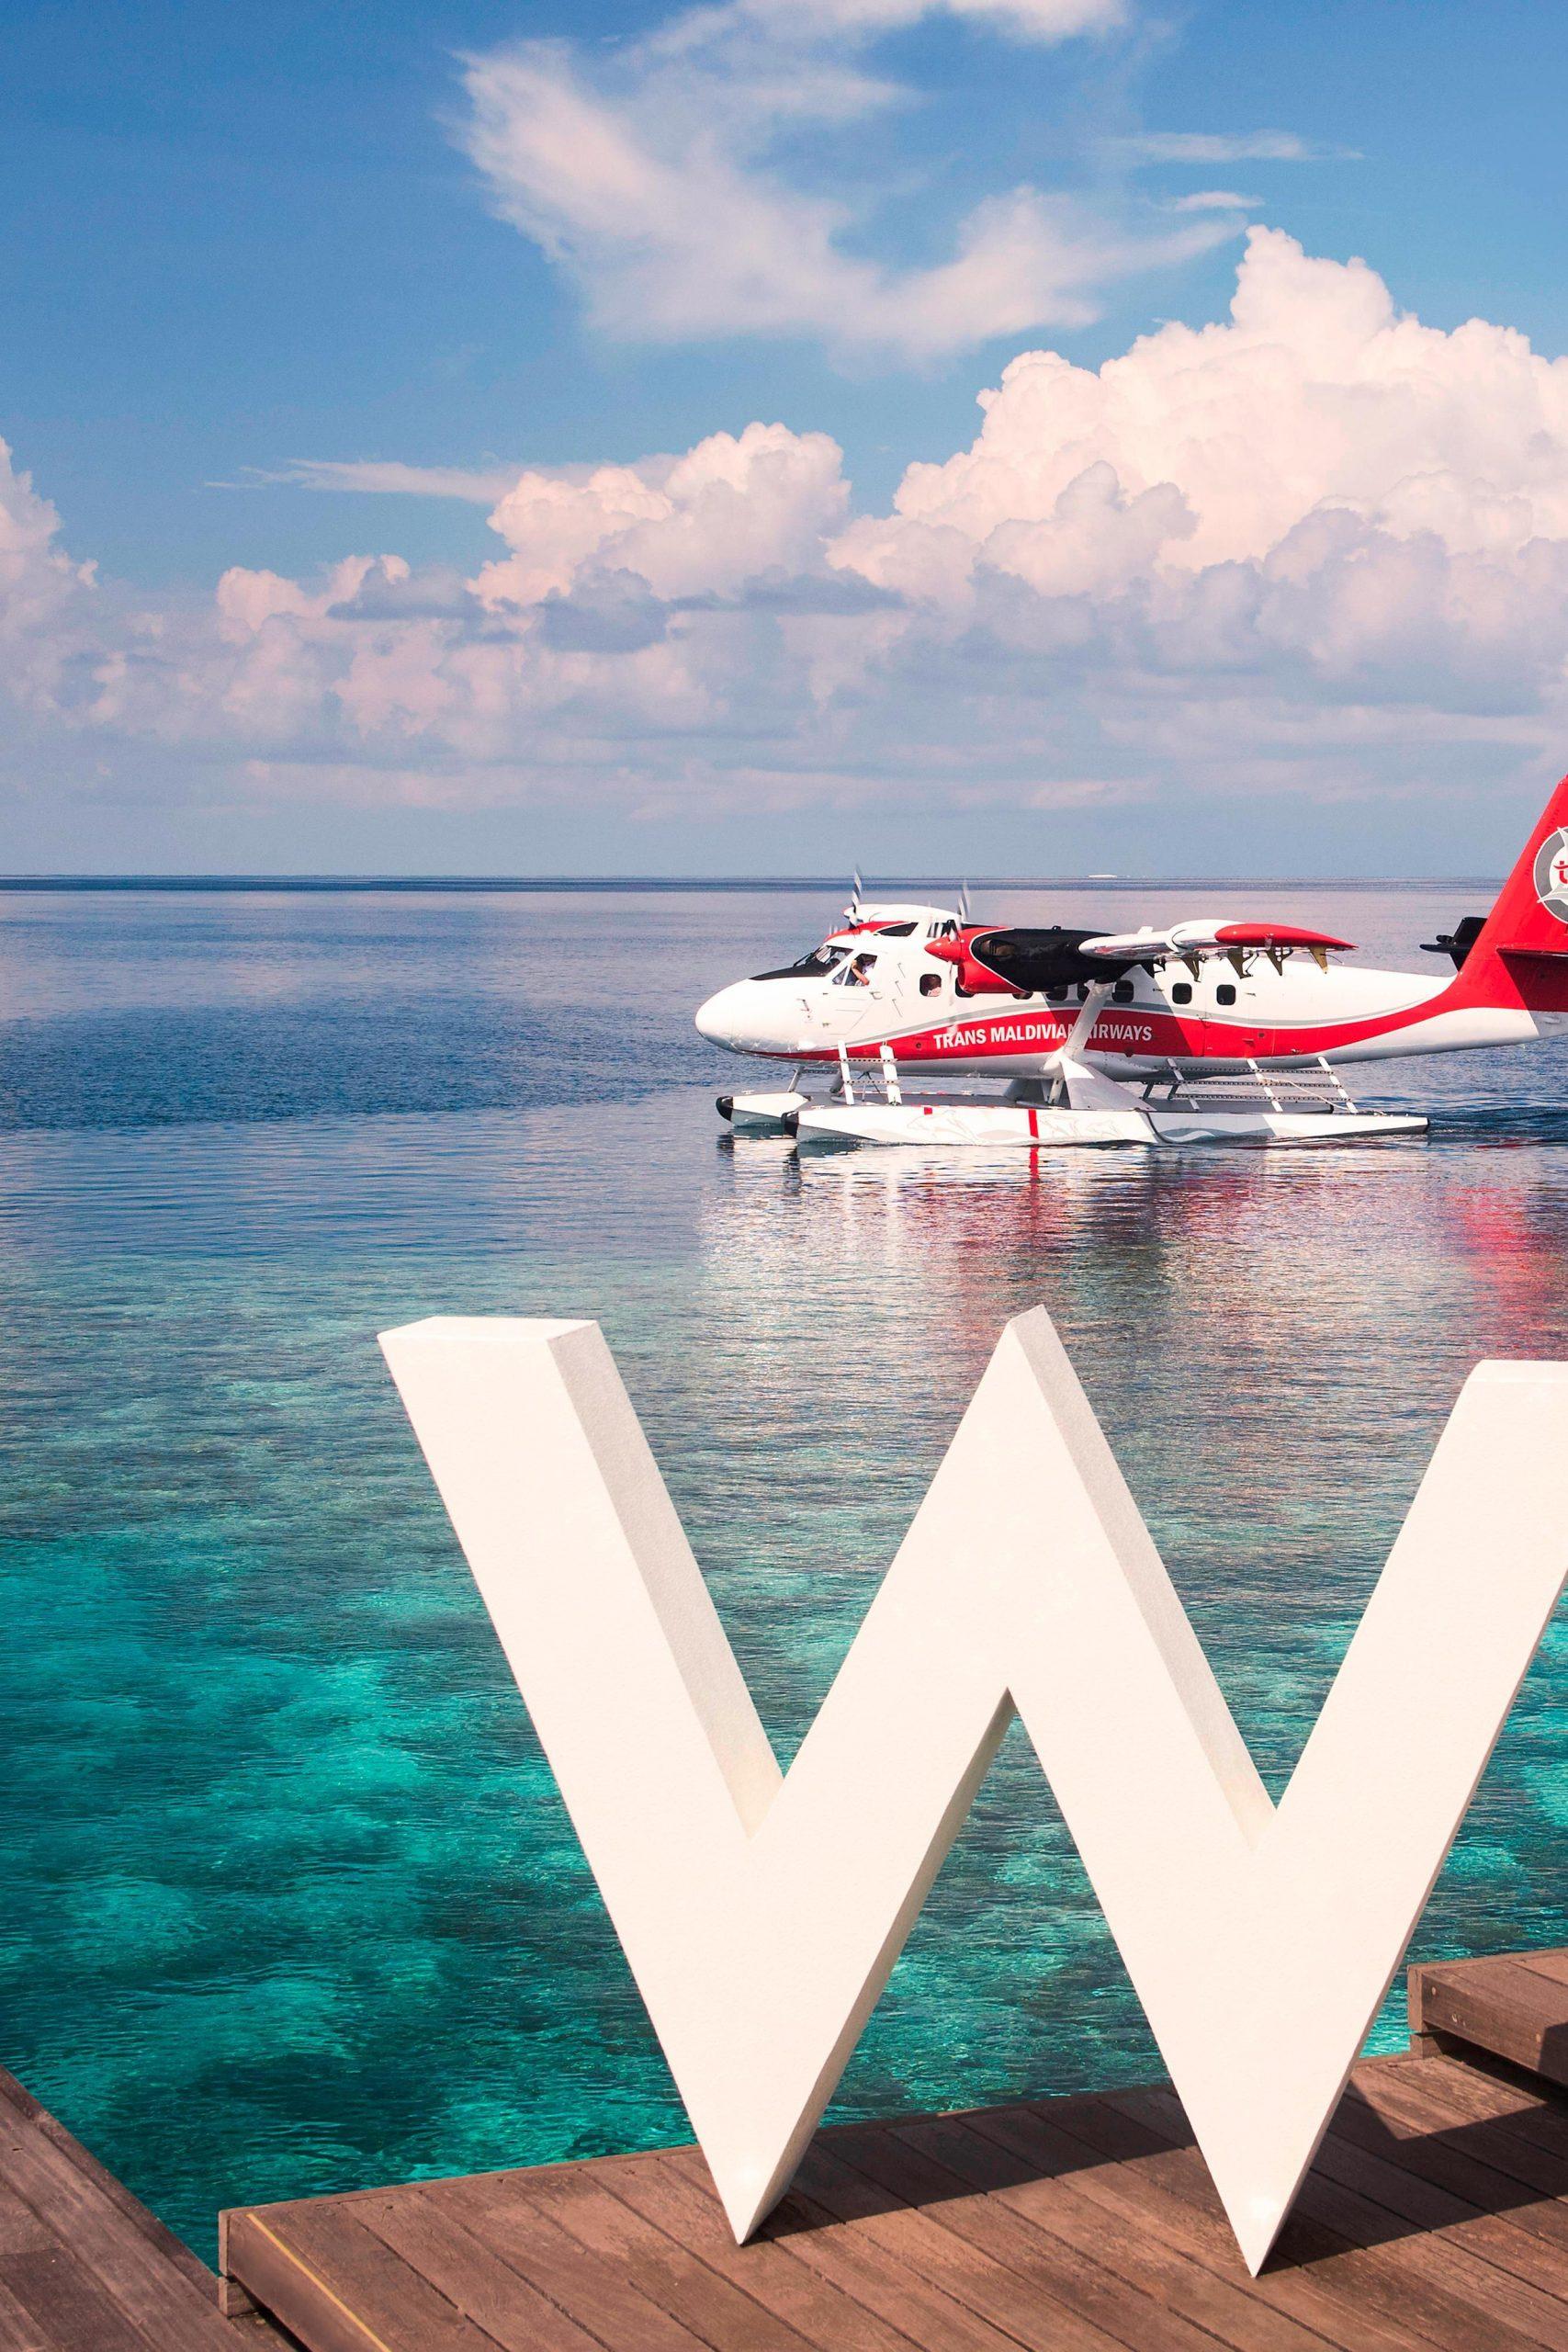 mlewh-seaplane-4137-ver-clsc